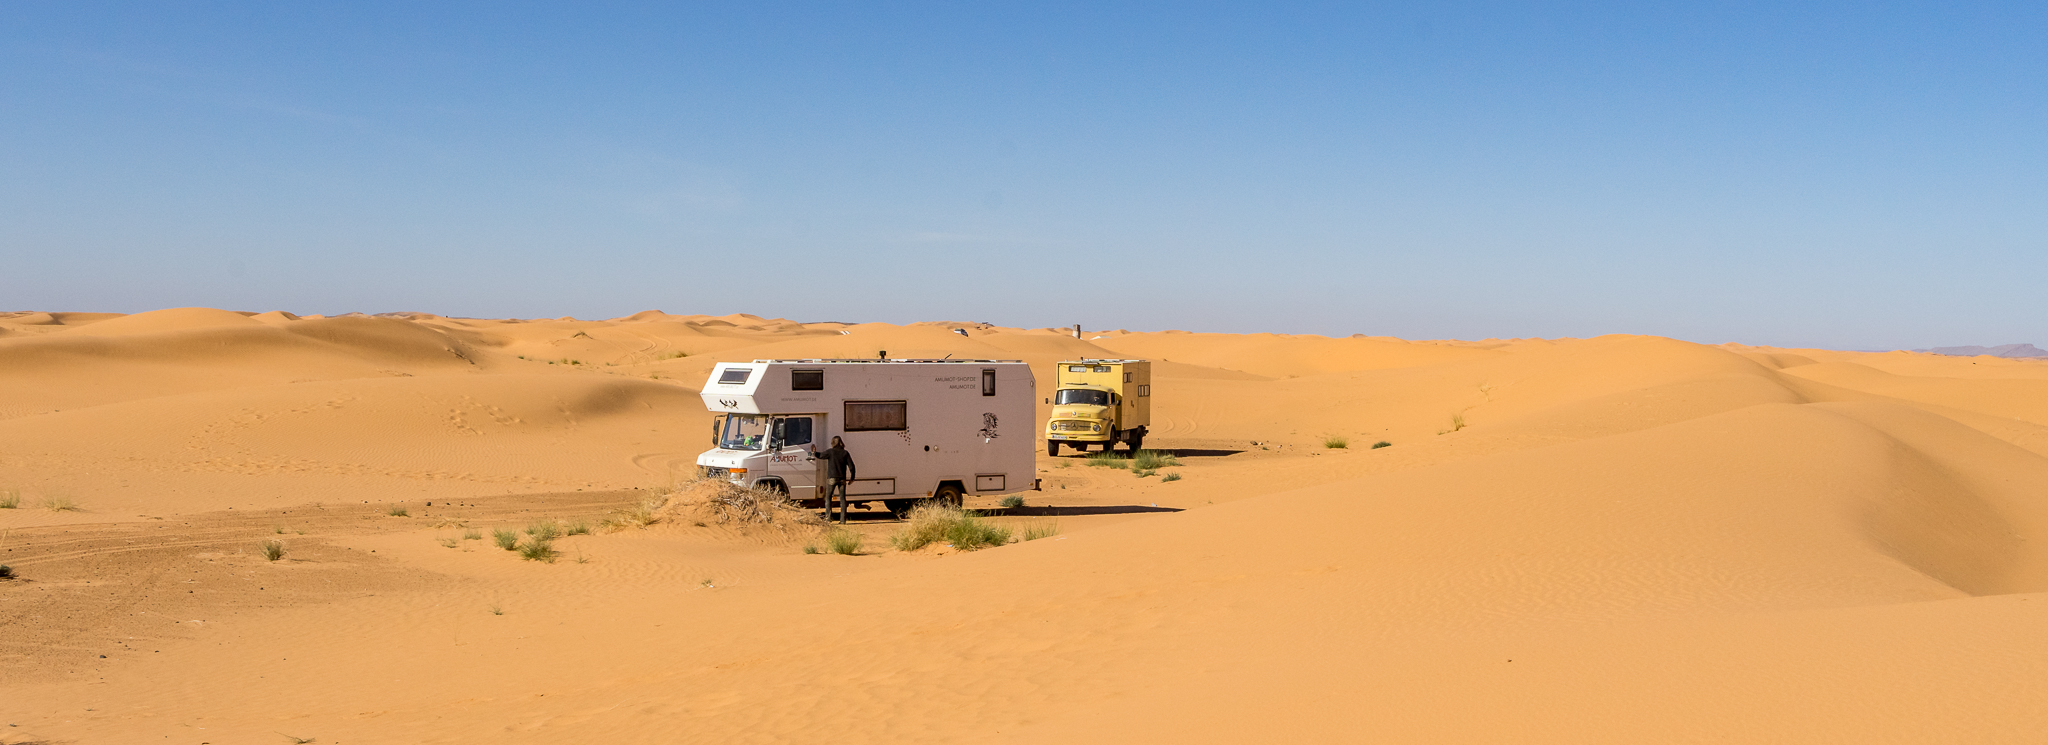 Marokko Teil 4: Erg Chebbi – Motorkamele im Wüstensand